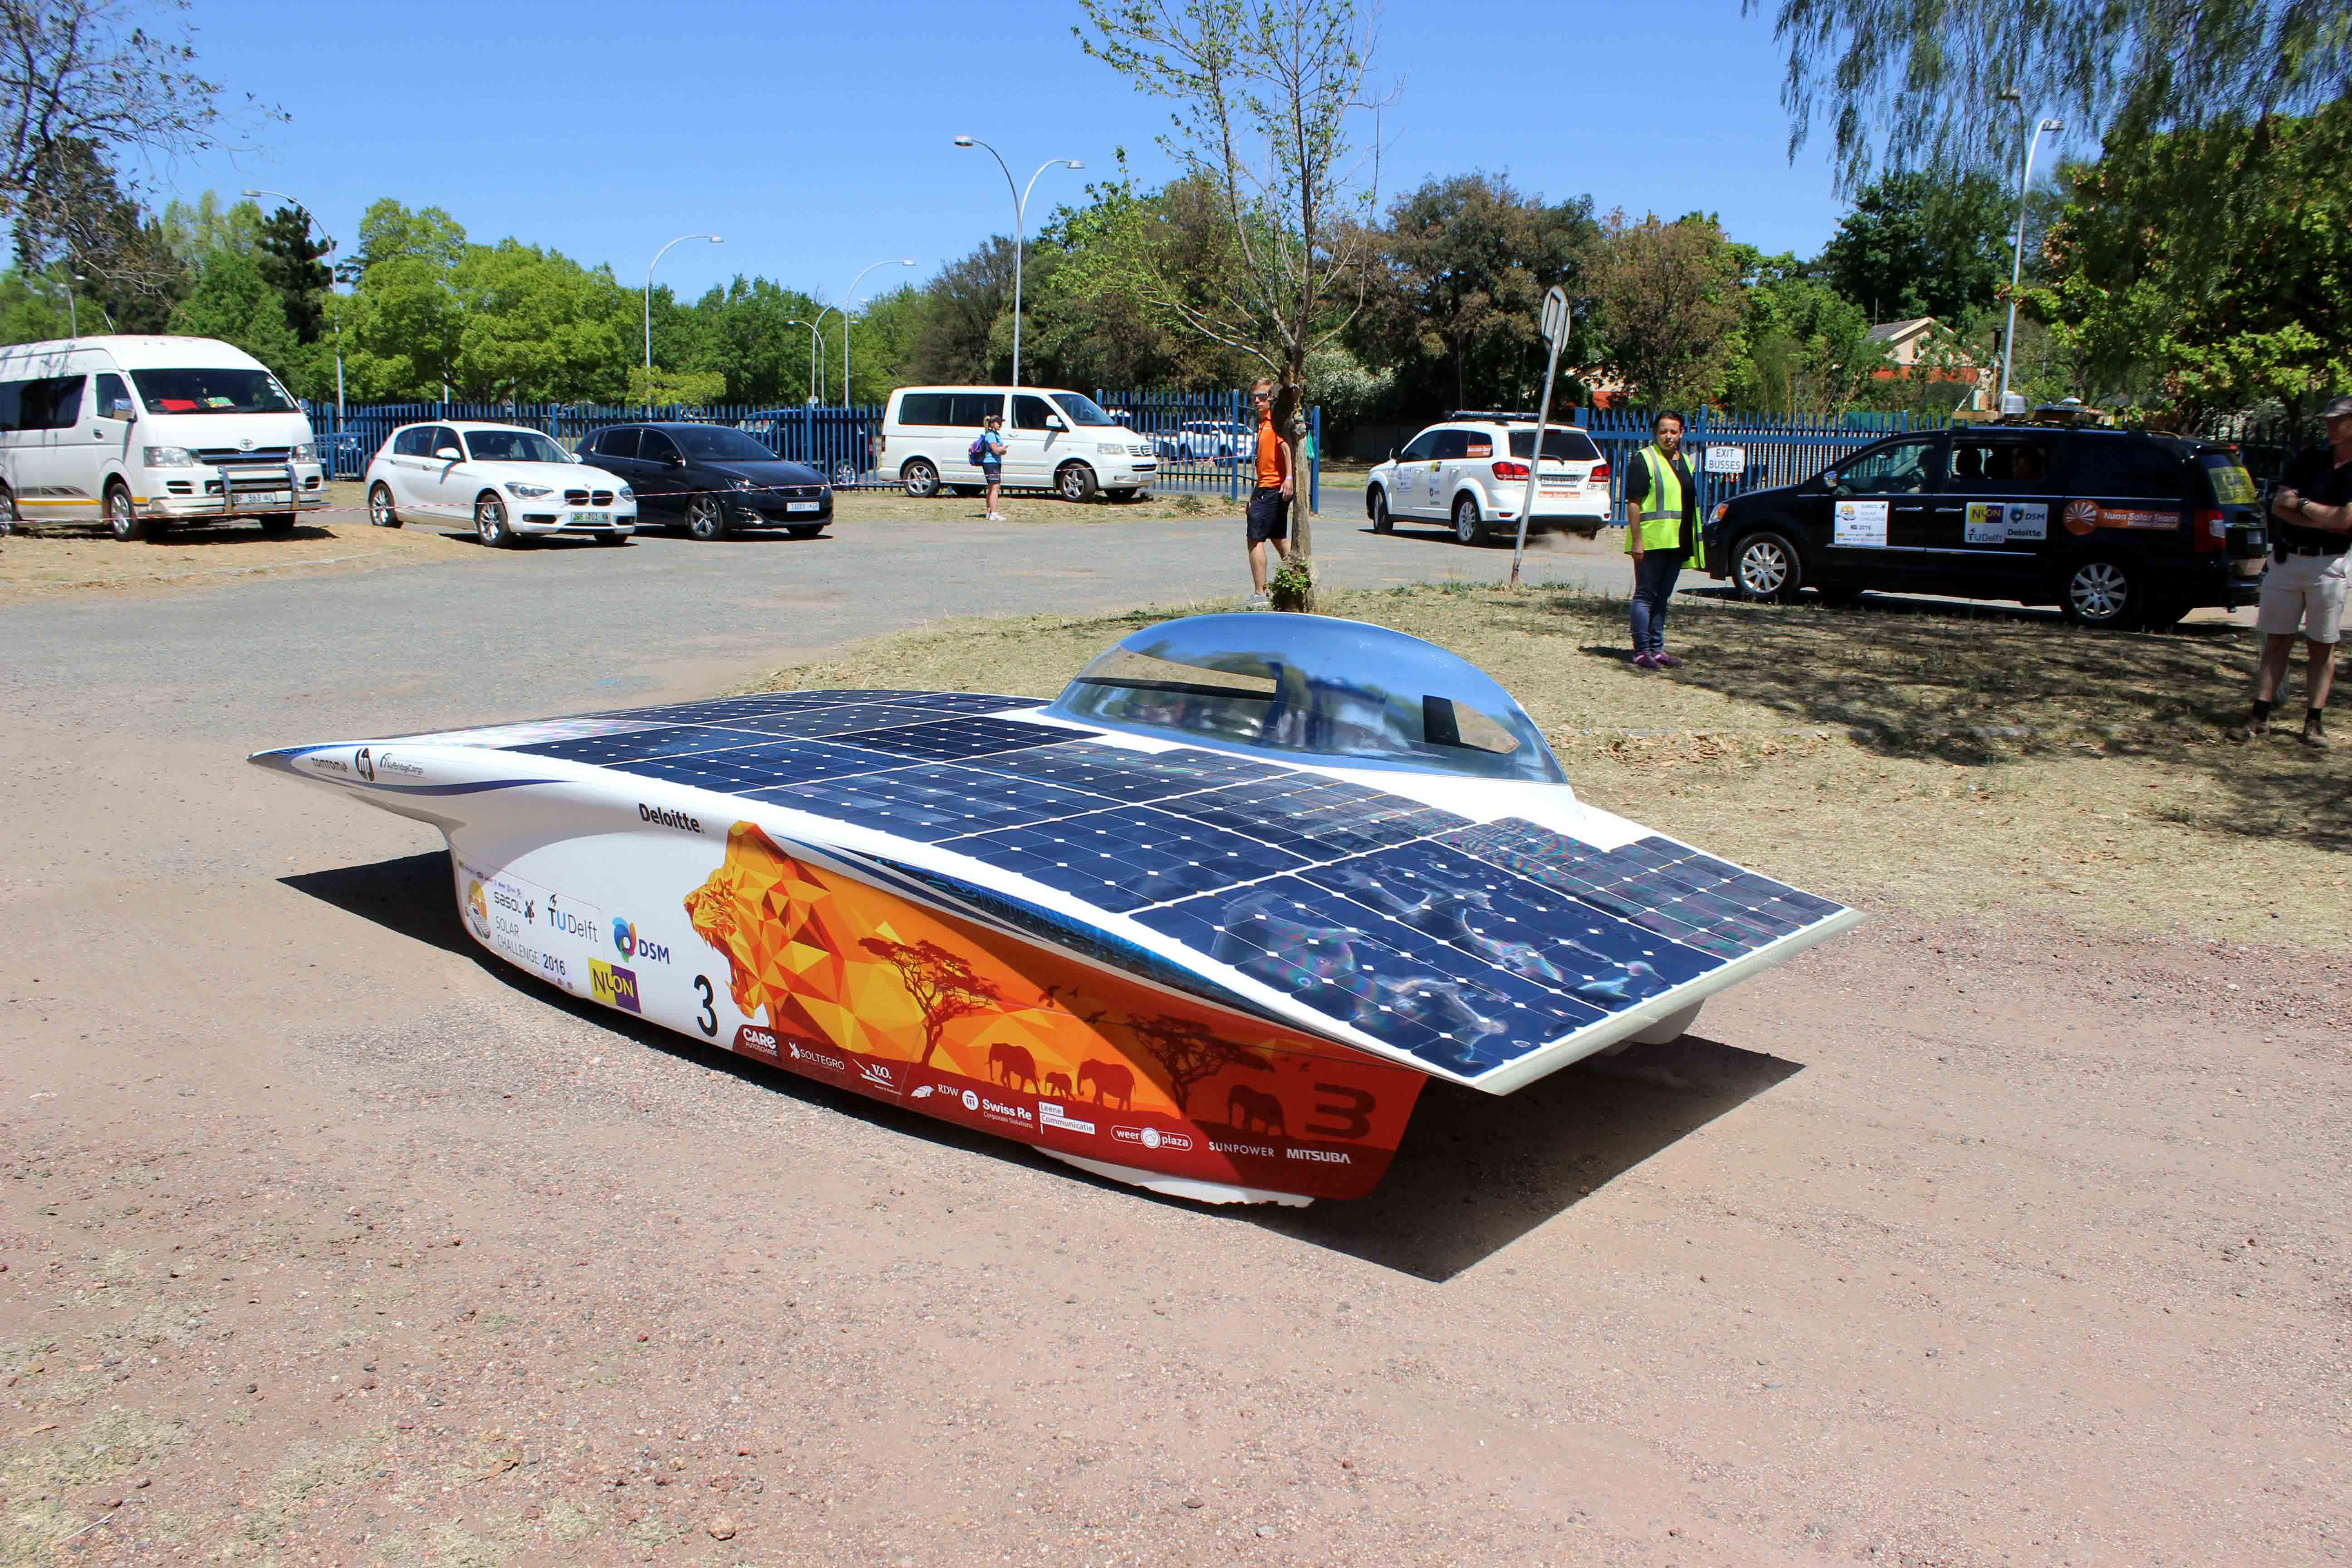 Solar cars crosses finish line as records tumble vaalweekblad